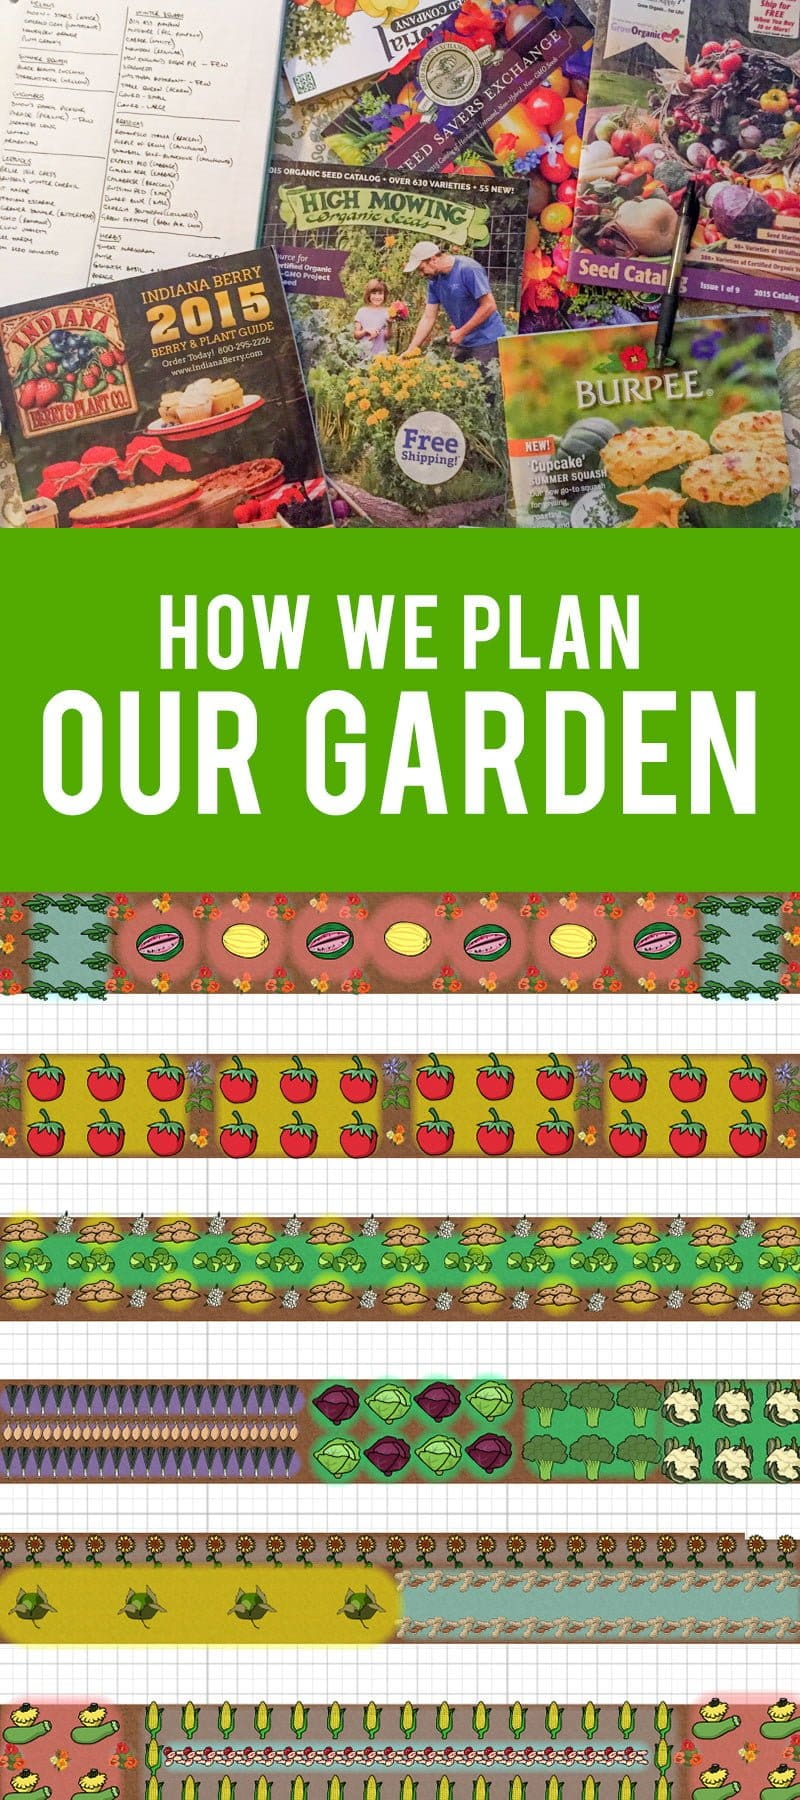 How We Plan Our Garden